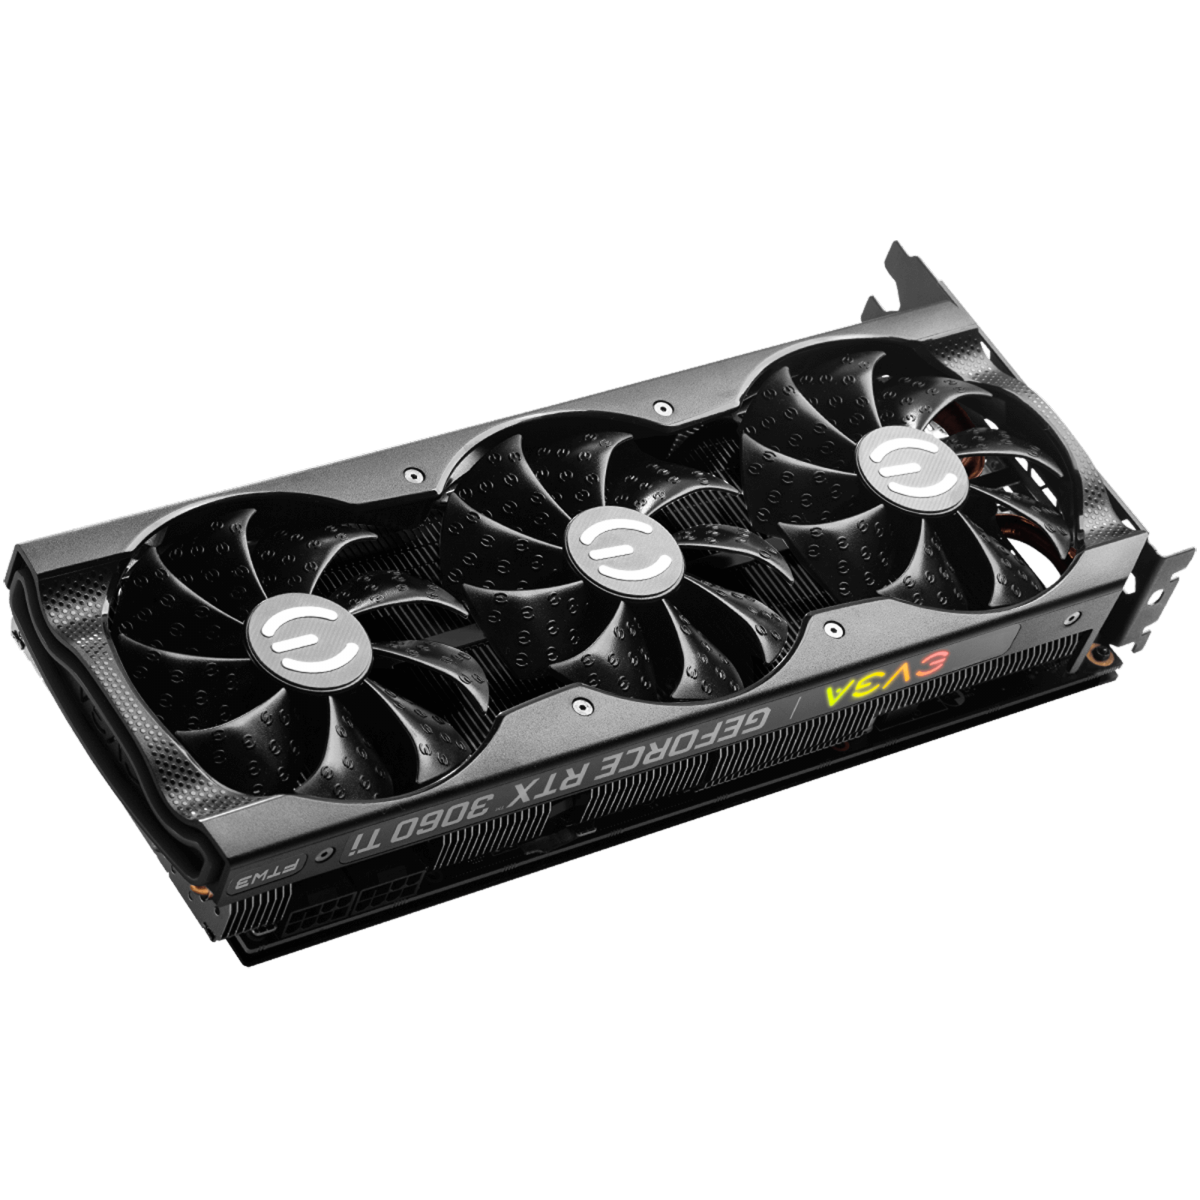 Placa de Vídeo EVGA GeForce RTX 3060 Ti FTW3 ULTRA GAMING, 8GB, GDDR6, 256bit, 08G-P5-3667-KR